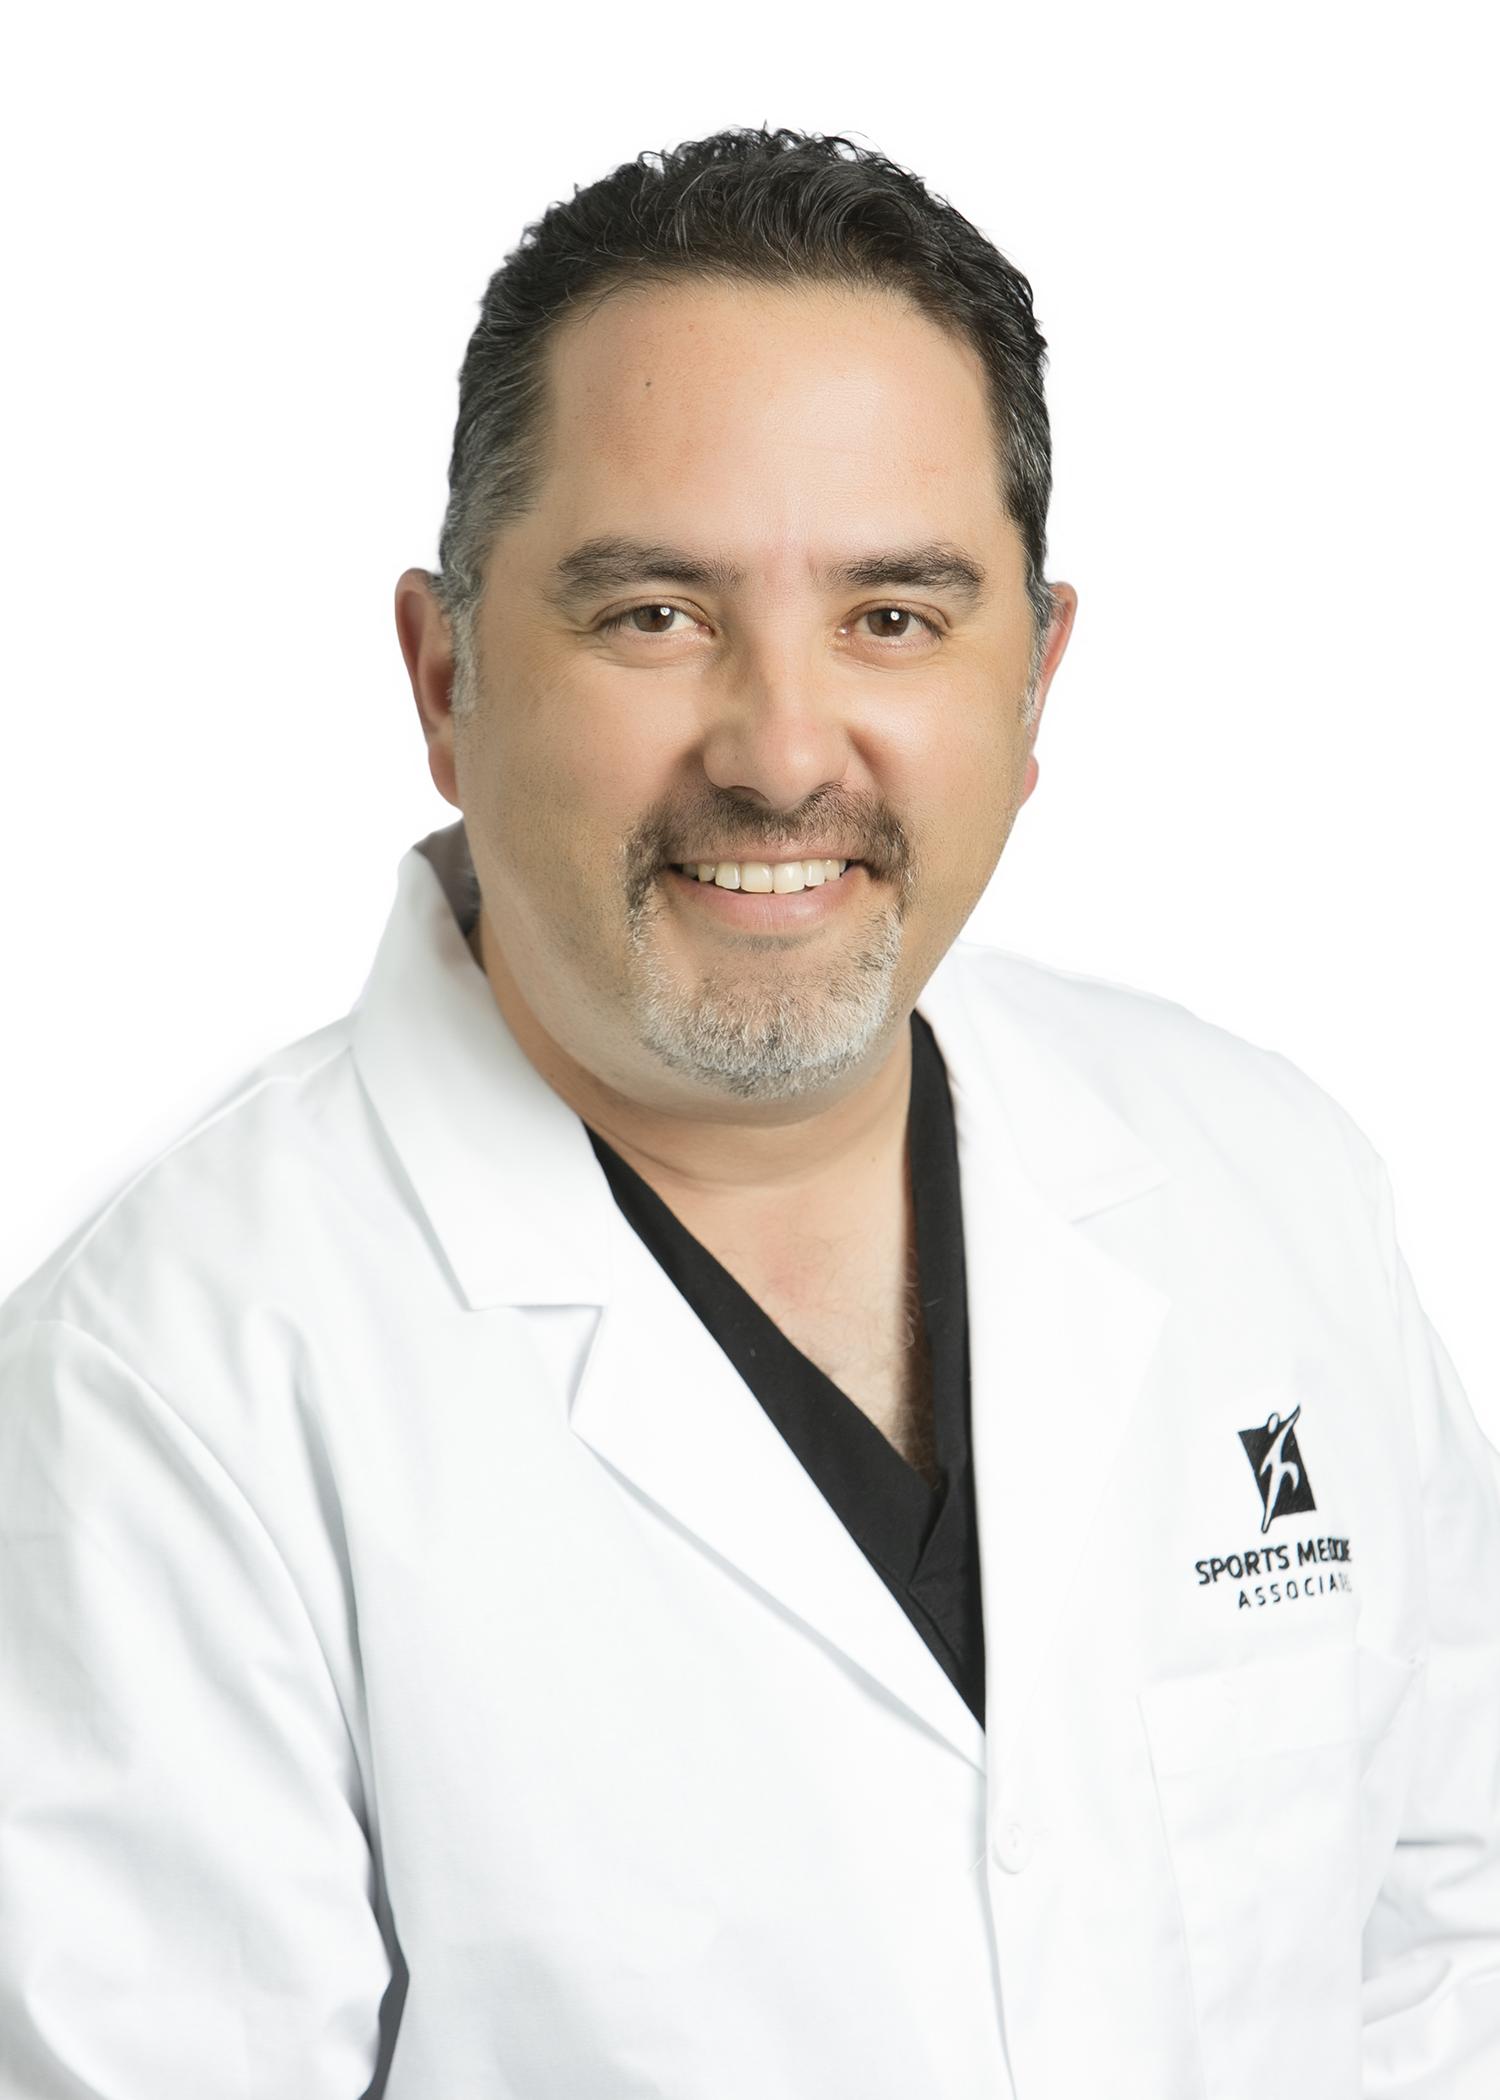 Timothy Palomera, M.D. - Primary Care Sports Medicine